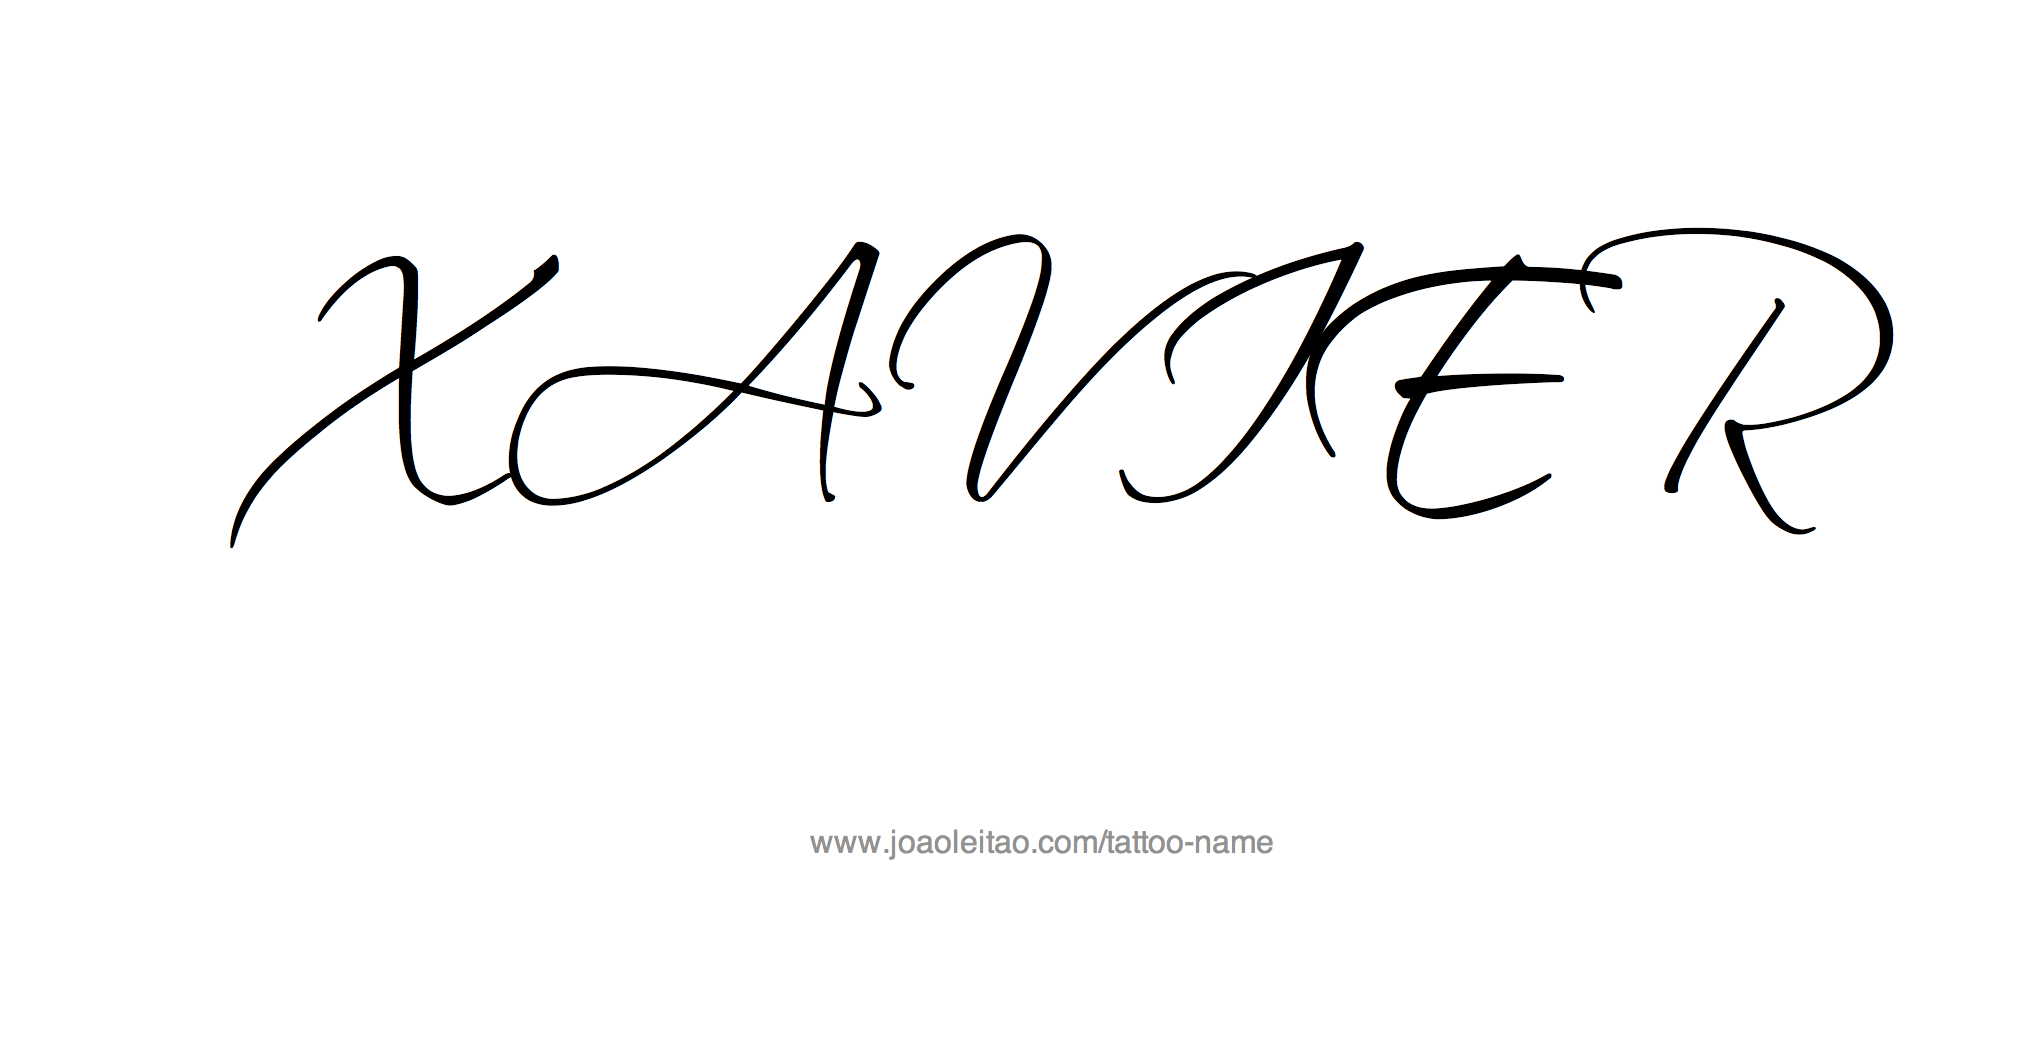 Xavier Name Tattoo Designs Name Tattoo Designs Tattoo Designs Name Tattoos